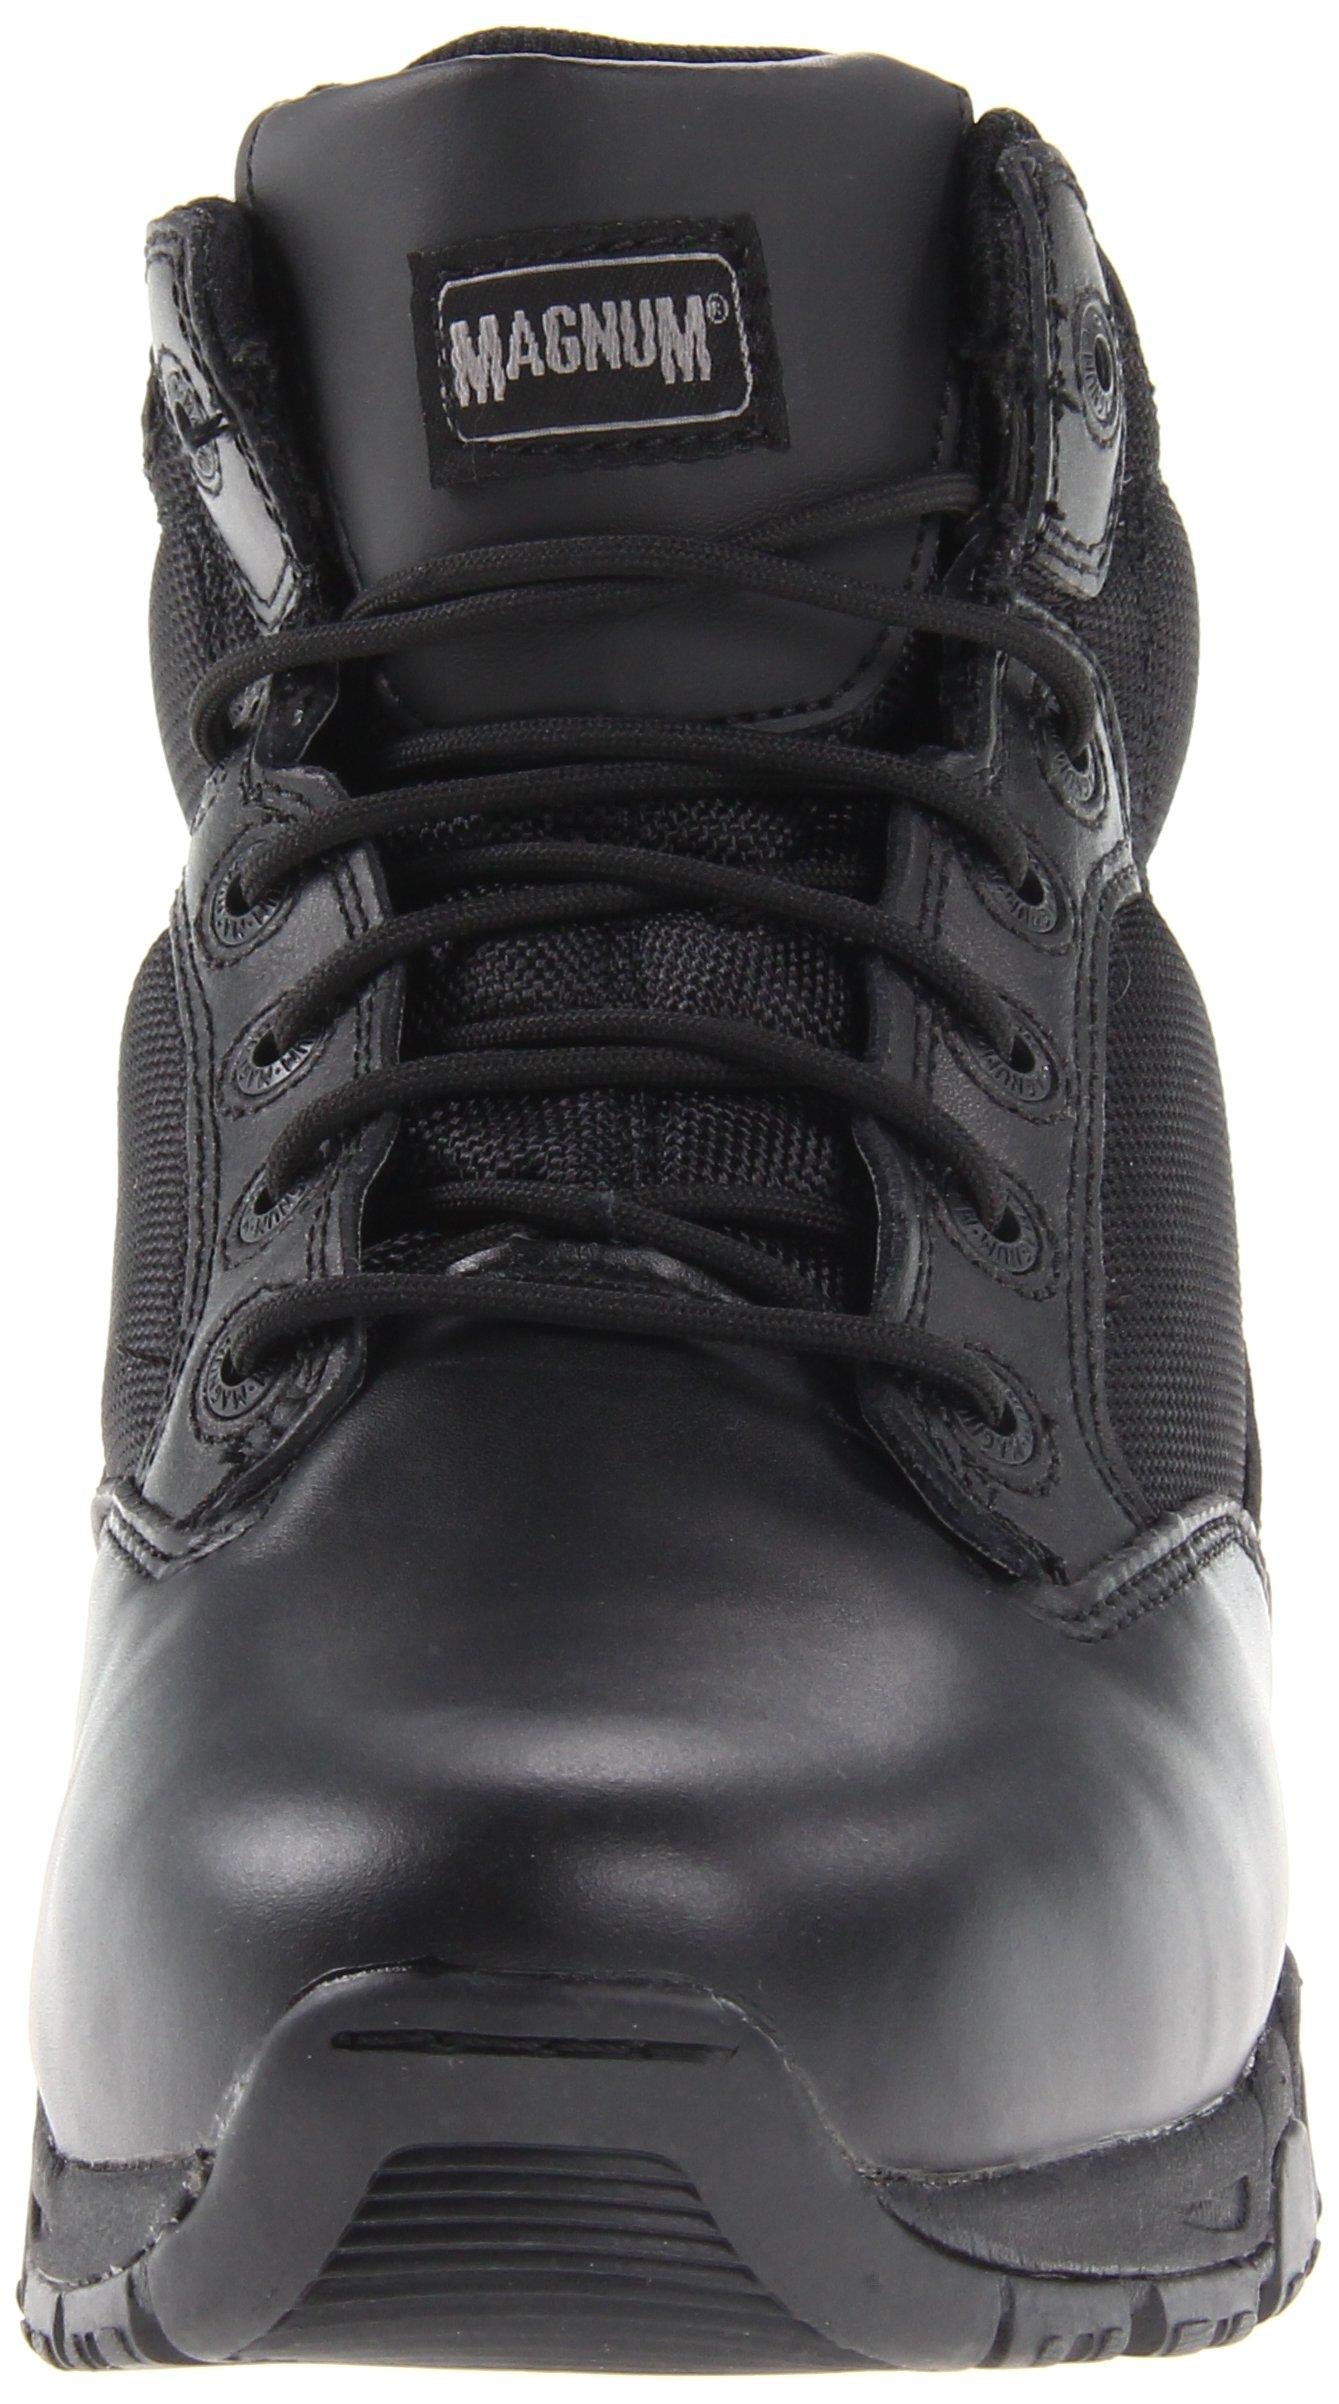 Magnum Men's Viper Pro 5 Waterproof Tactical Boot,Black,13 M US by Magnum (Image #4)